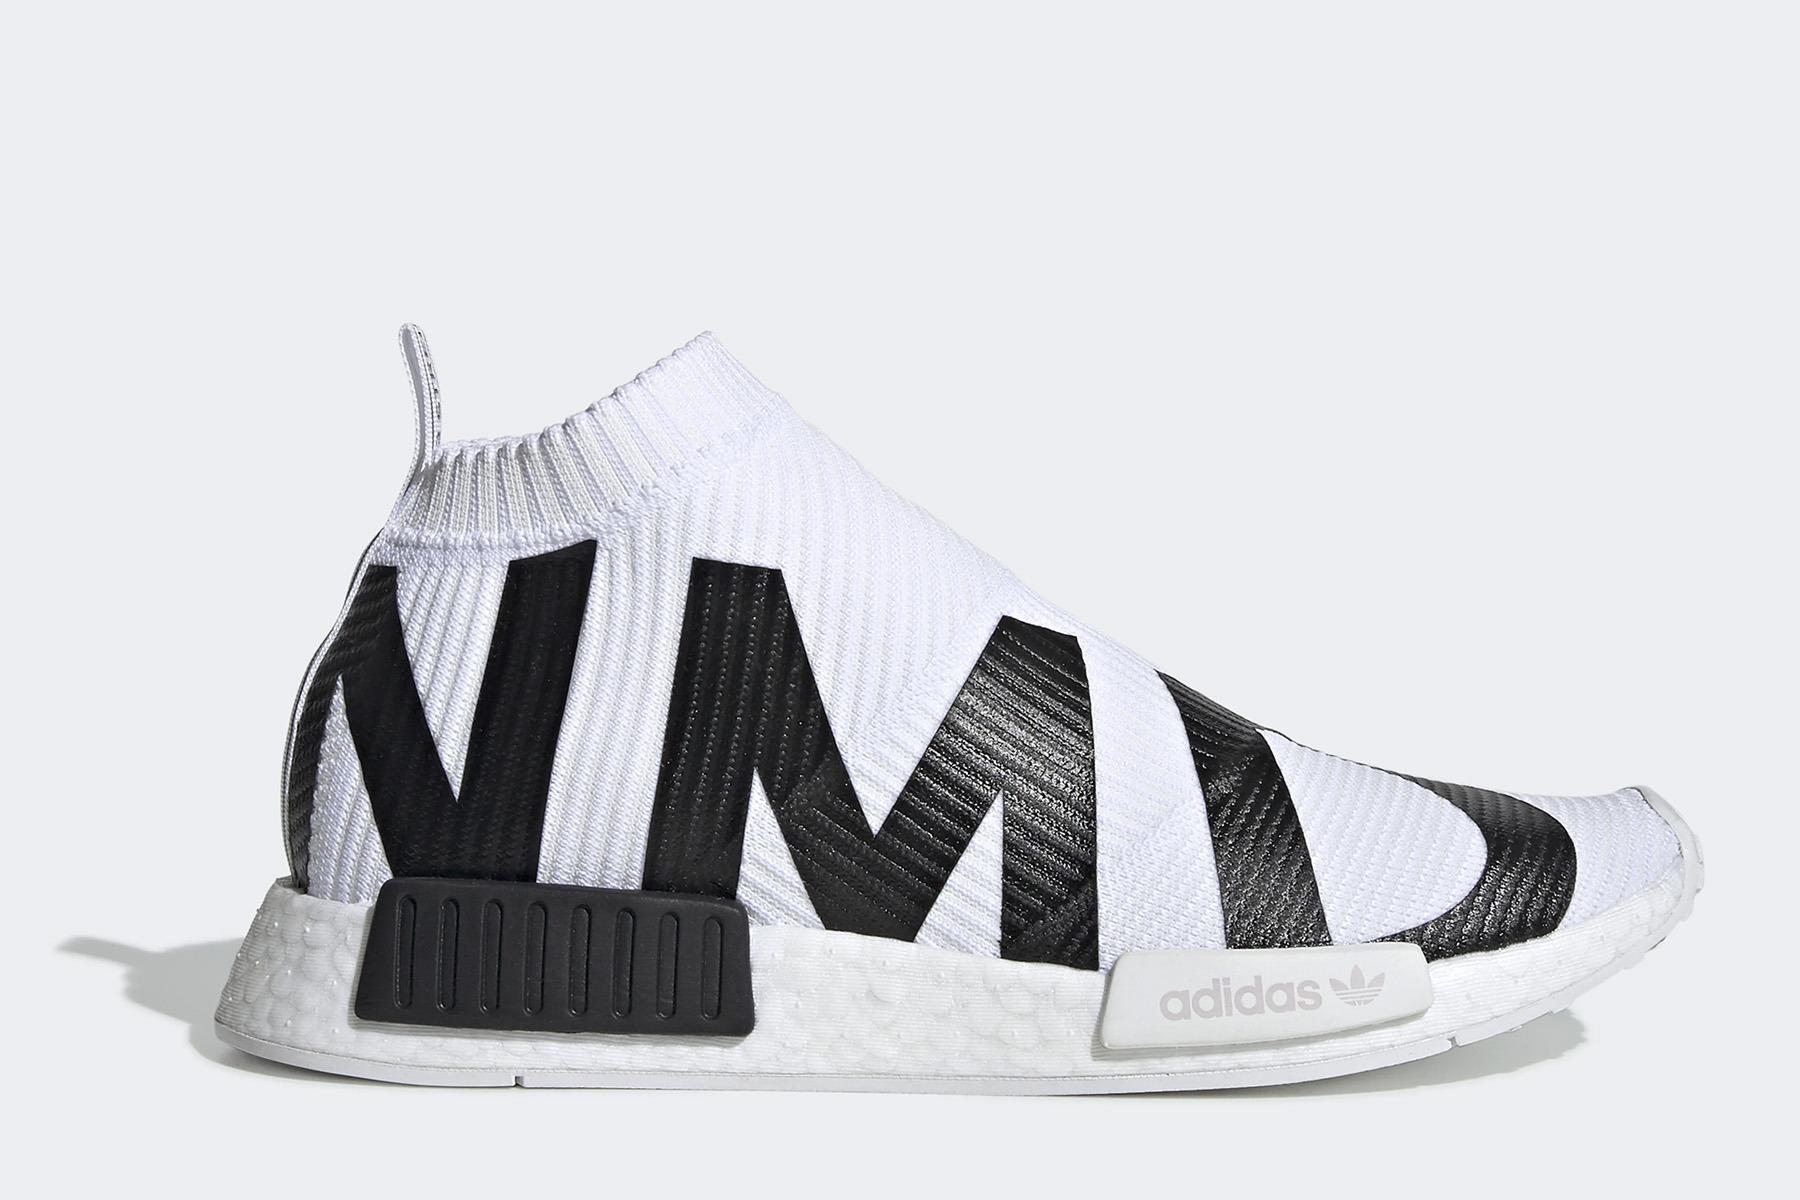 adidas NMD CS1 PK: Big Letter Style